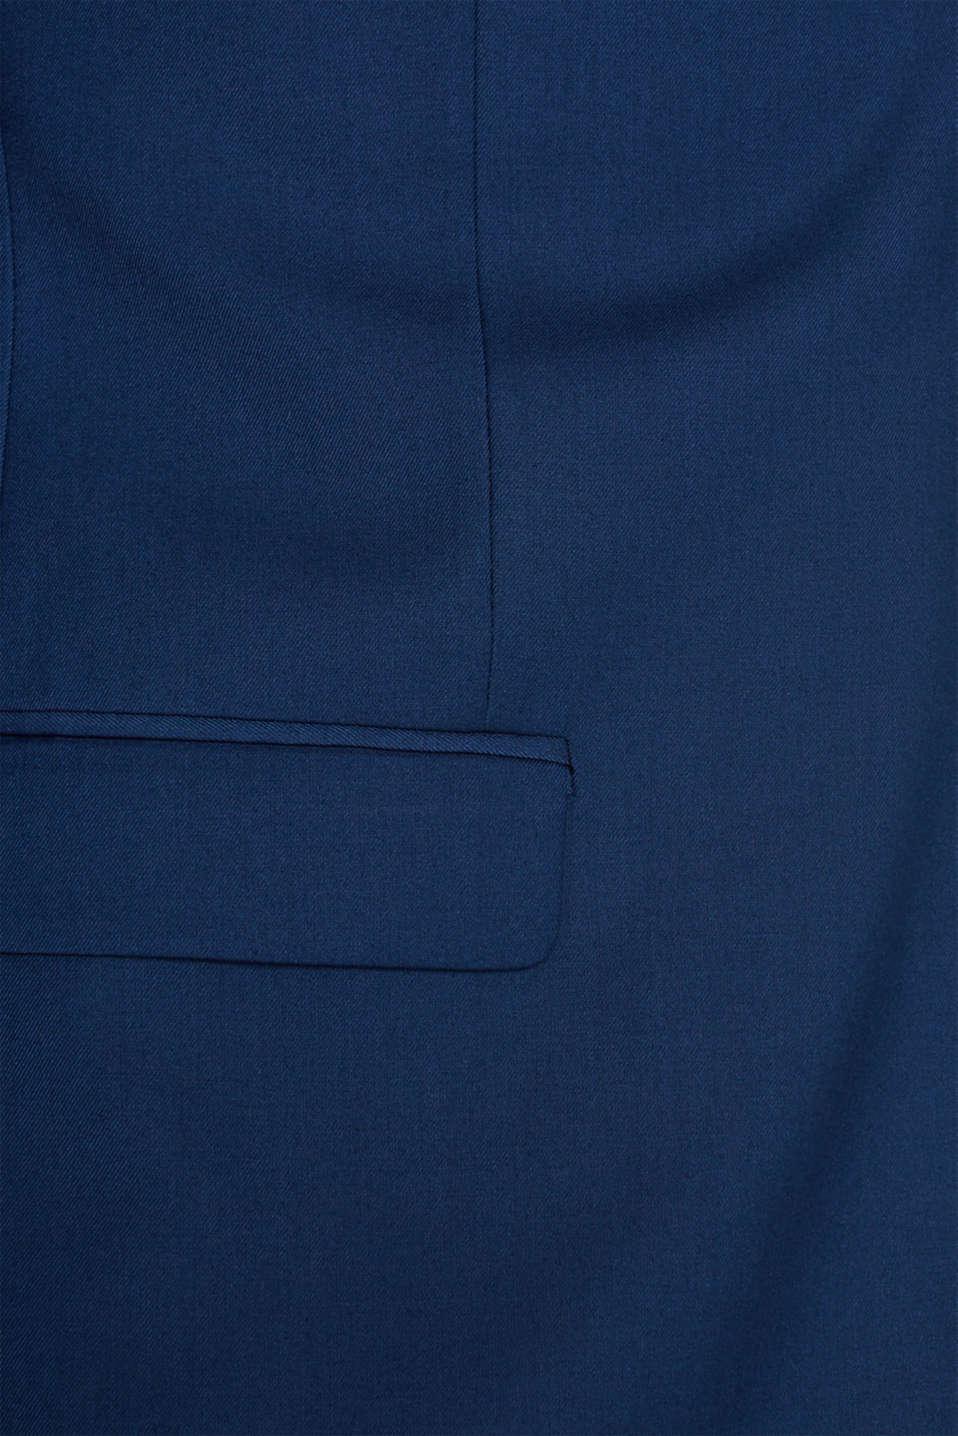 Blazers suit, BLUE, detail image number 4